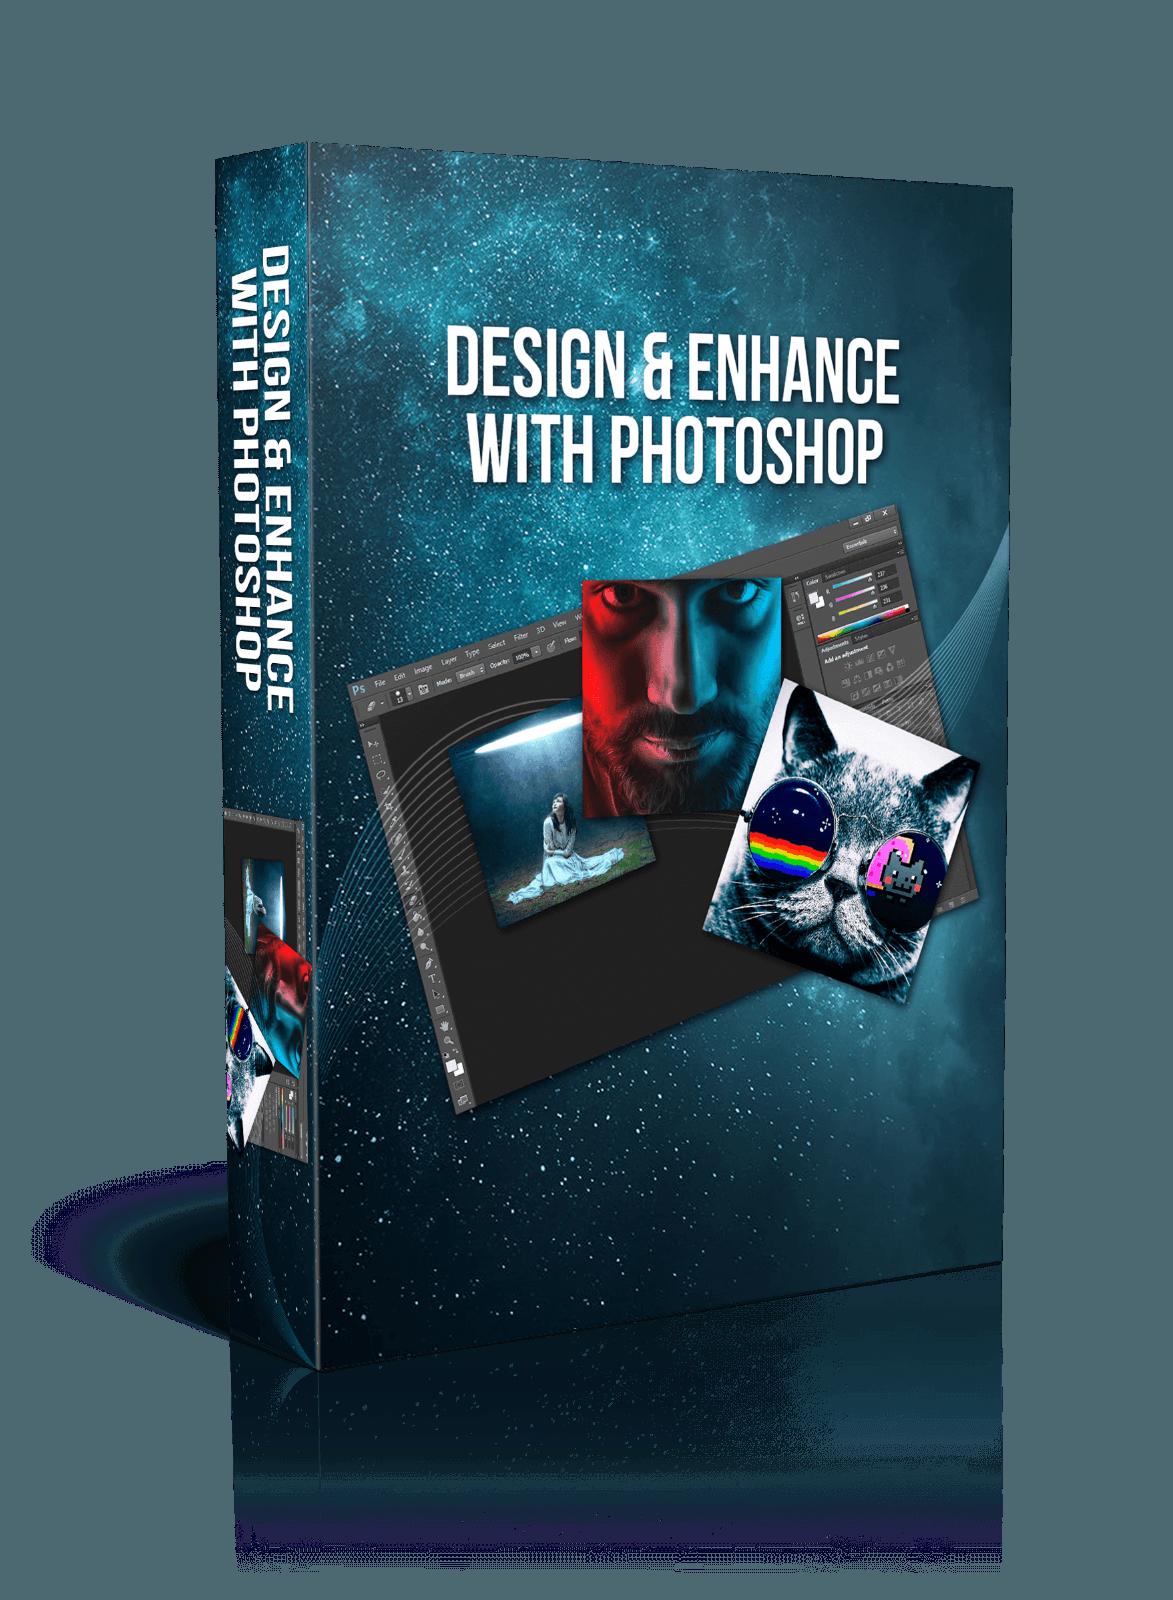 """DESIGN & ENHANCE WITH PHOTOSHOP"" - MASSIVE Training (HQ MP4 Videos + MP3)"